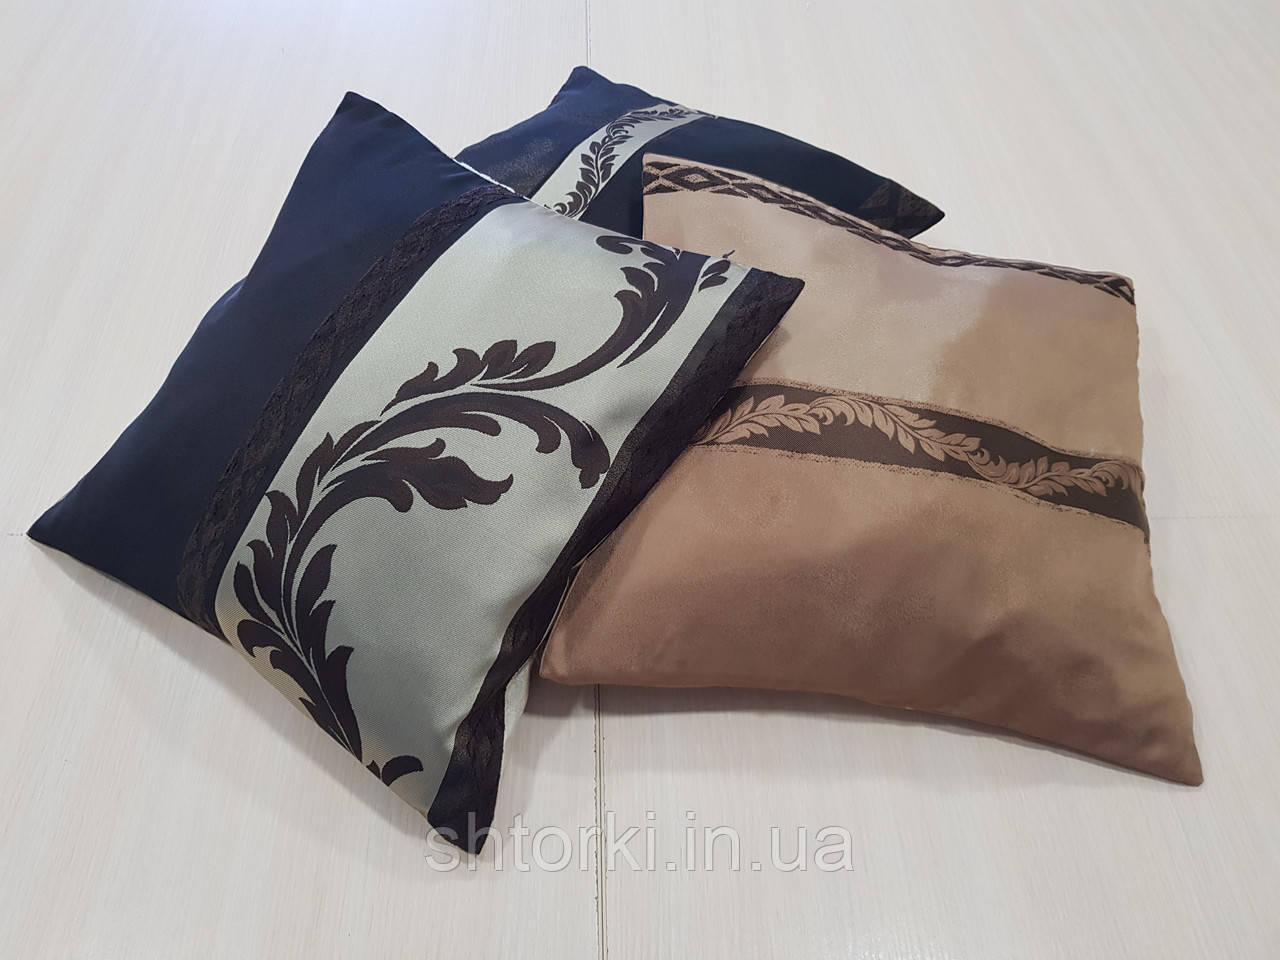 Комплект подушек коричневые, шоколад, беж, 3шт